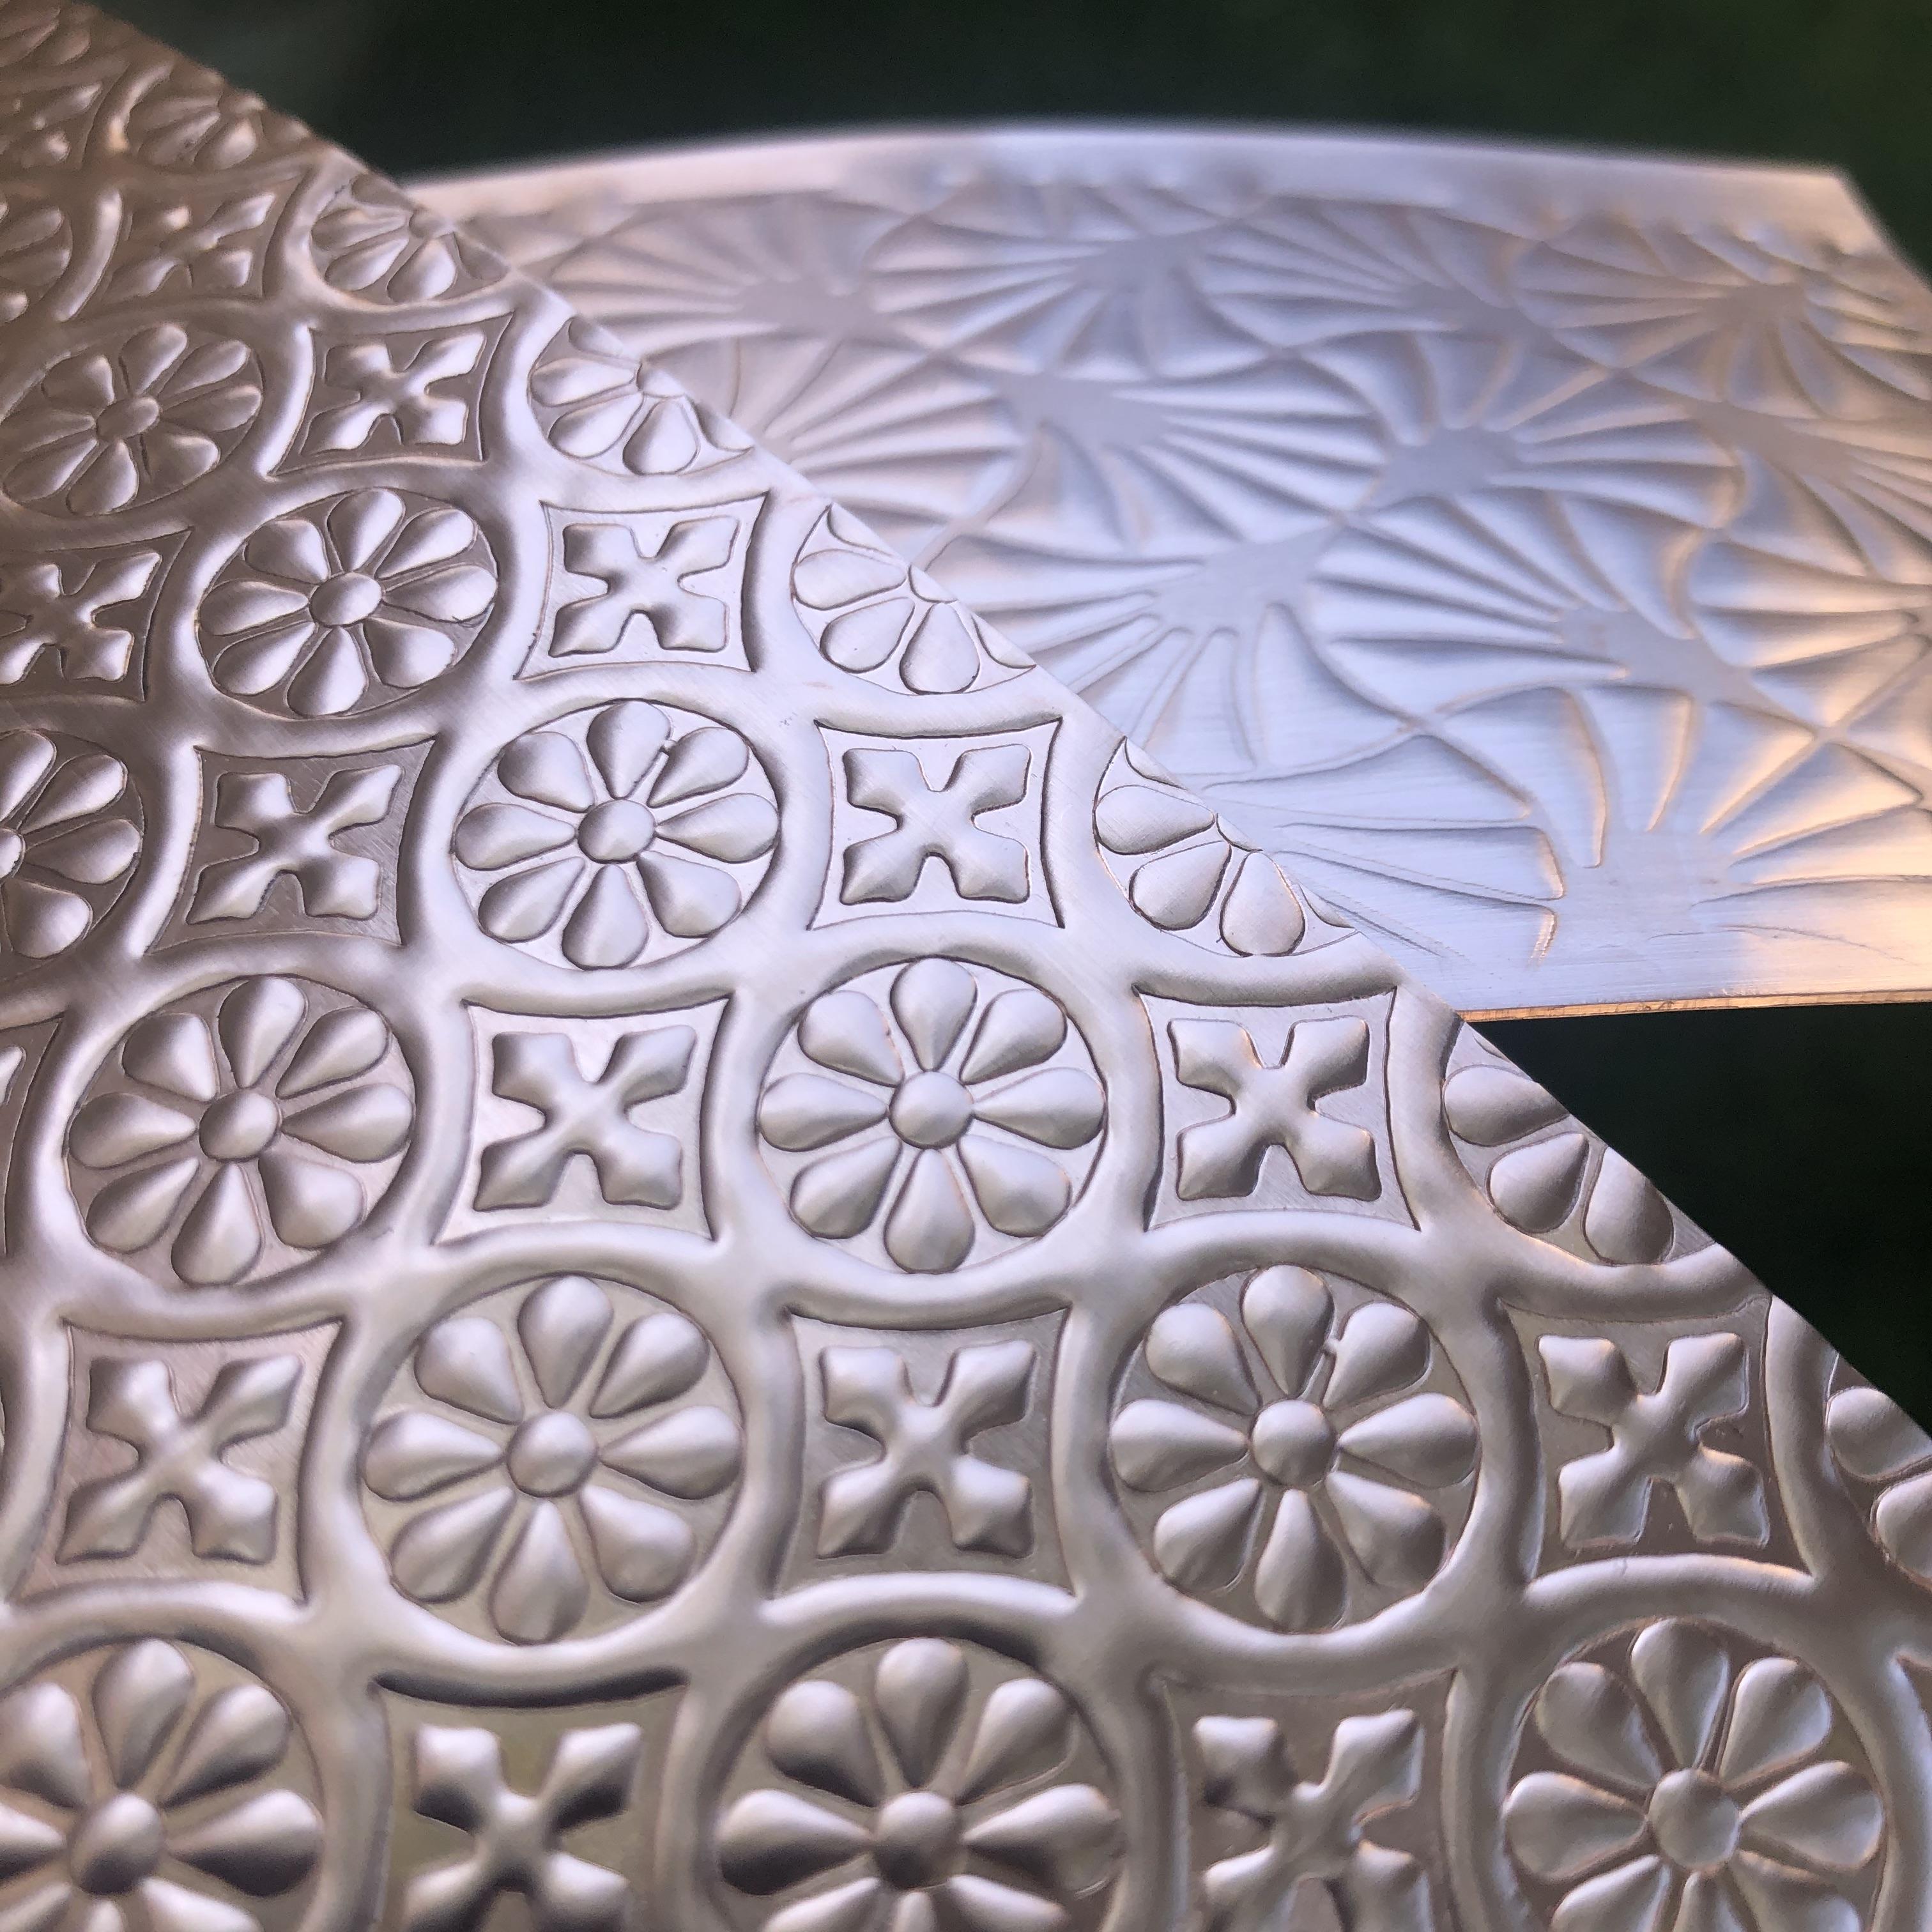 New texture plates